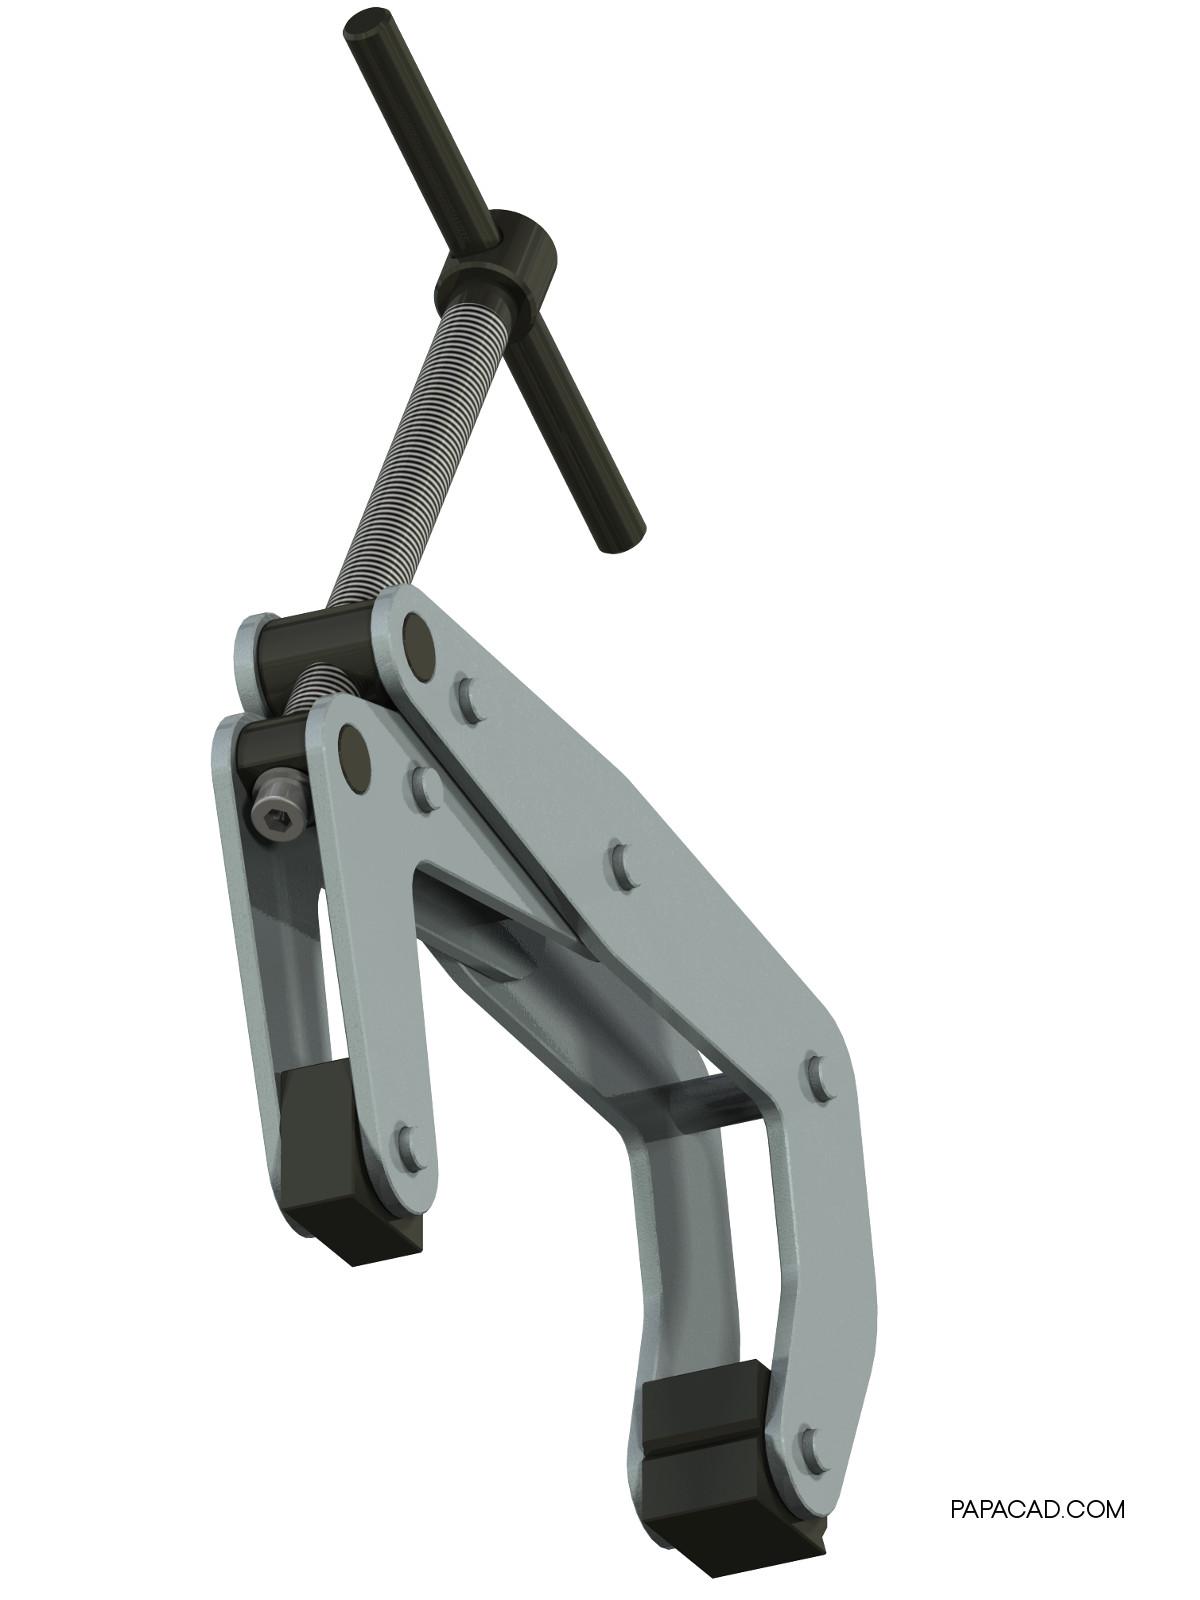 Kant Twist Clamp CAD design